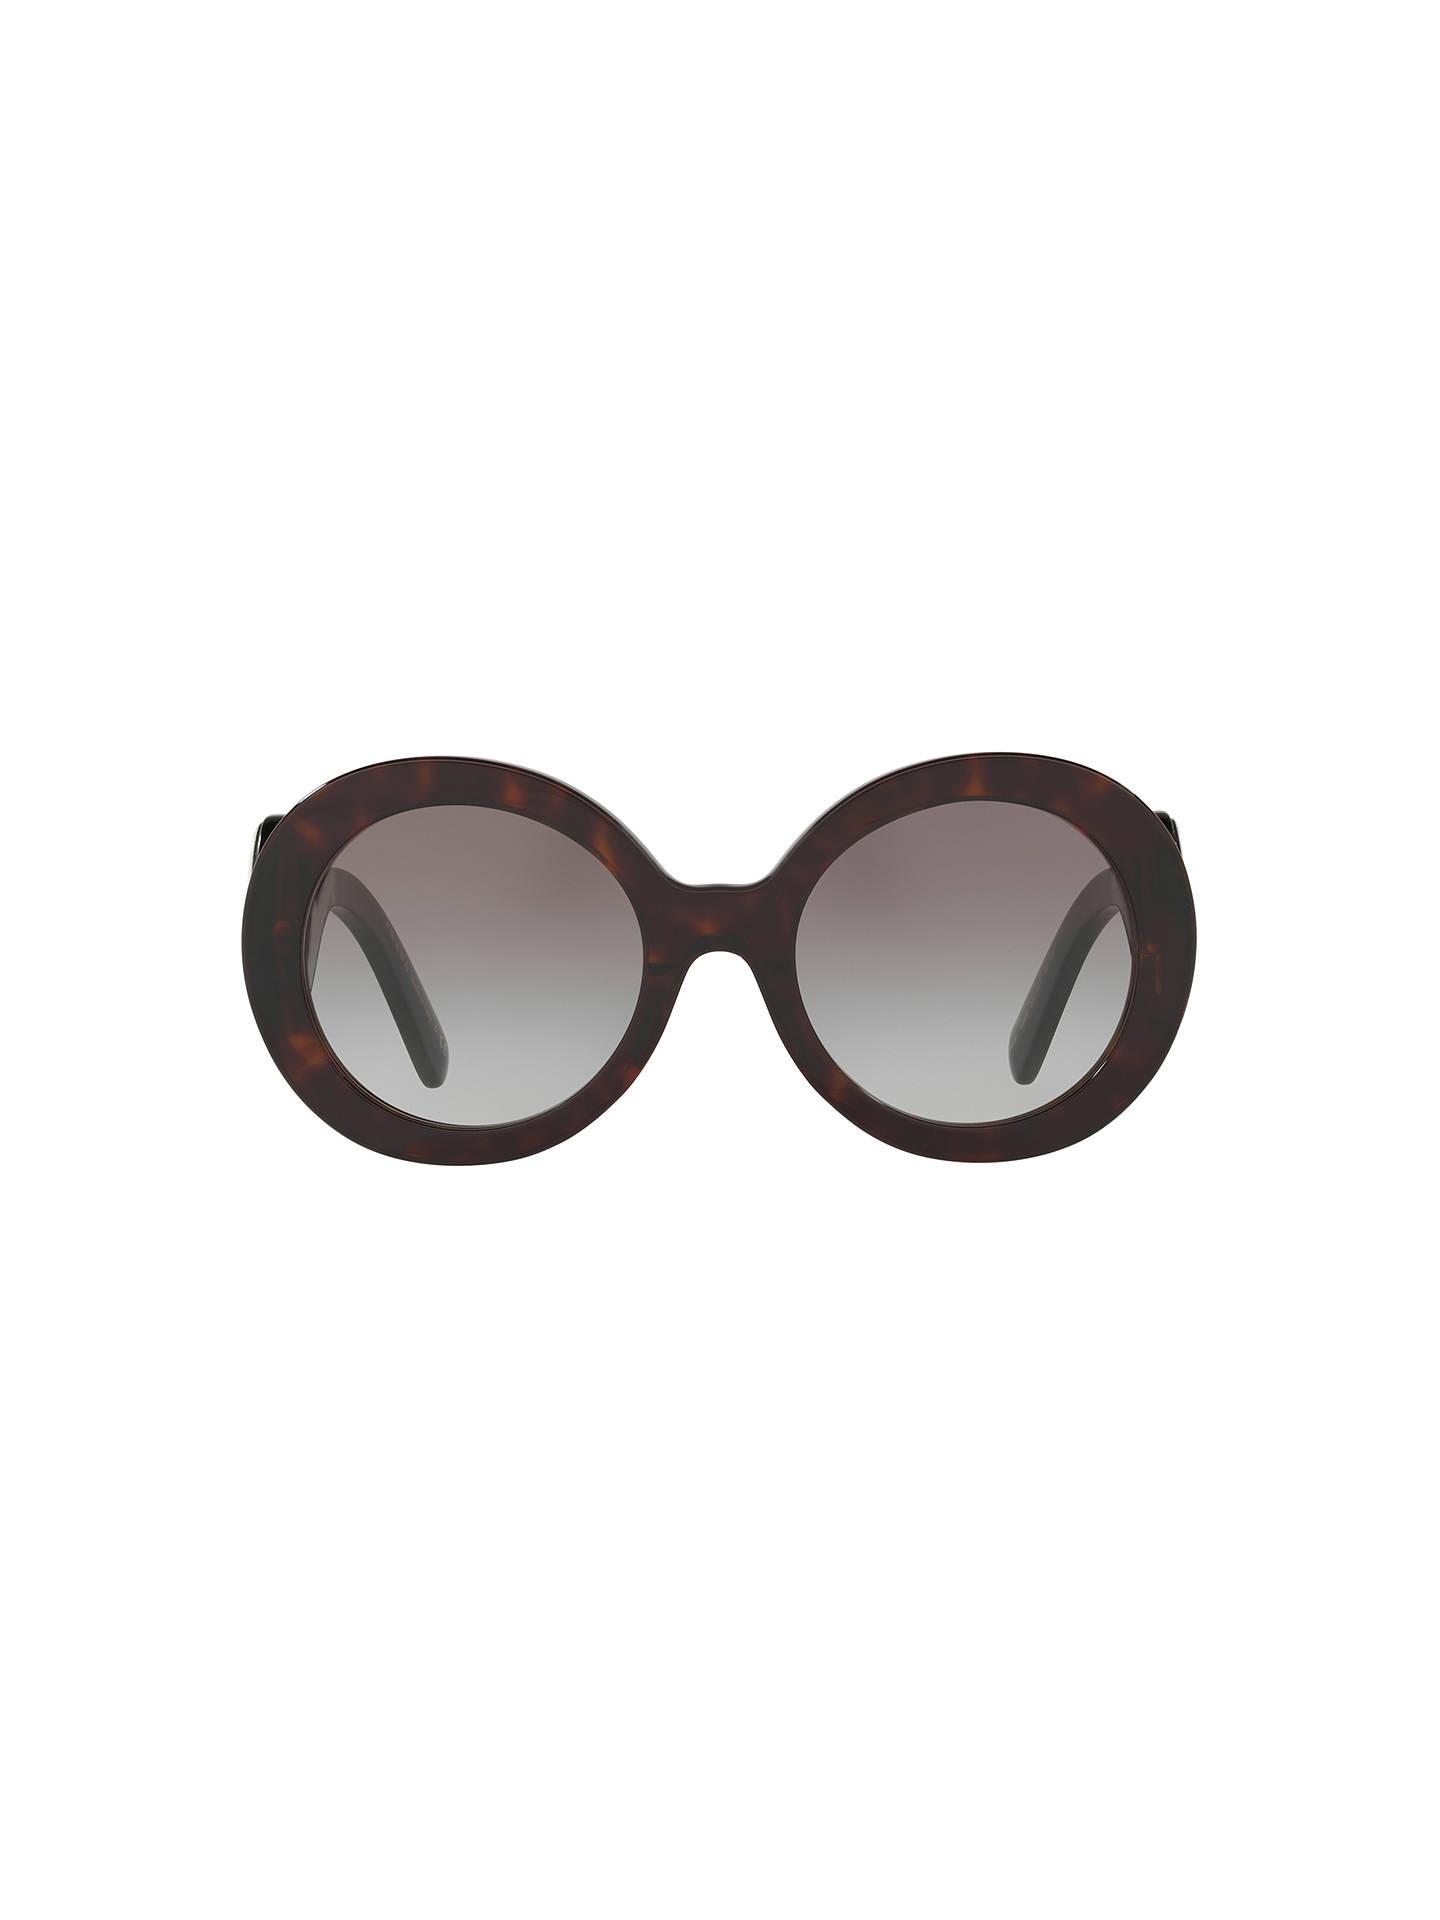 fcbd2d6d5044 ... Buy Prada PR 08TS Minimal Baroque Round Sunglasses